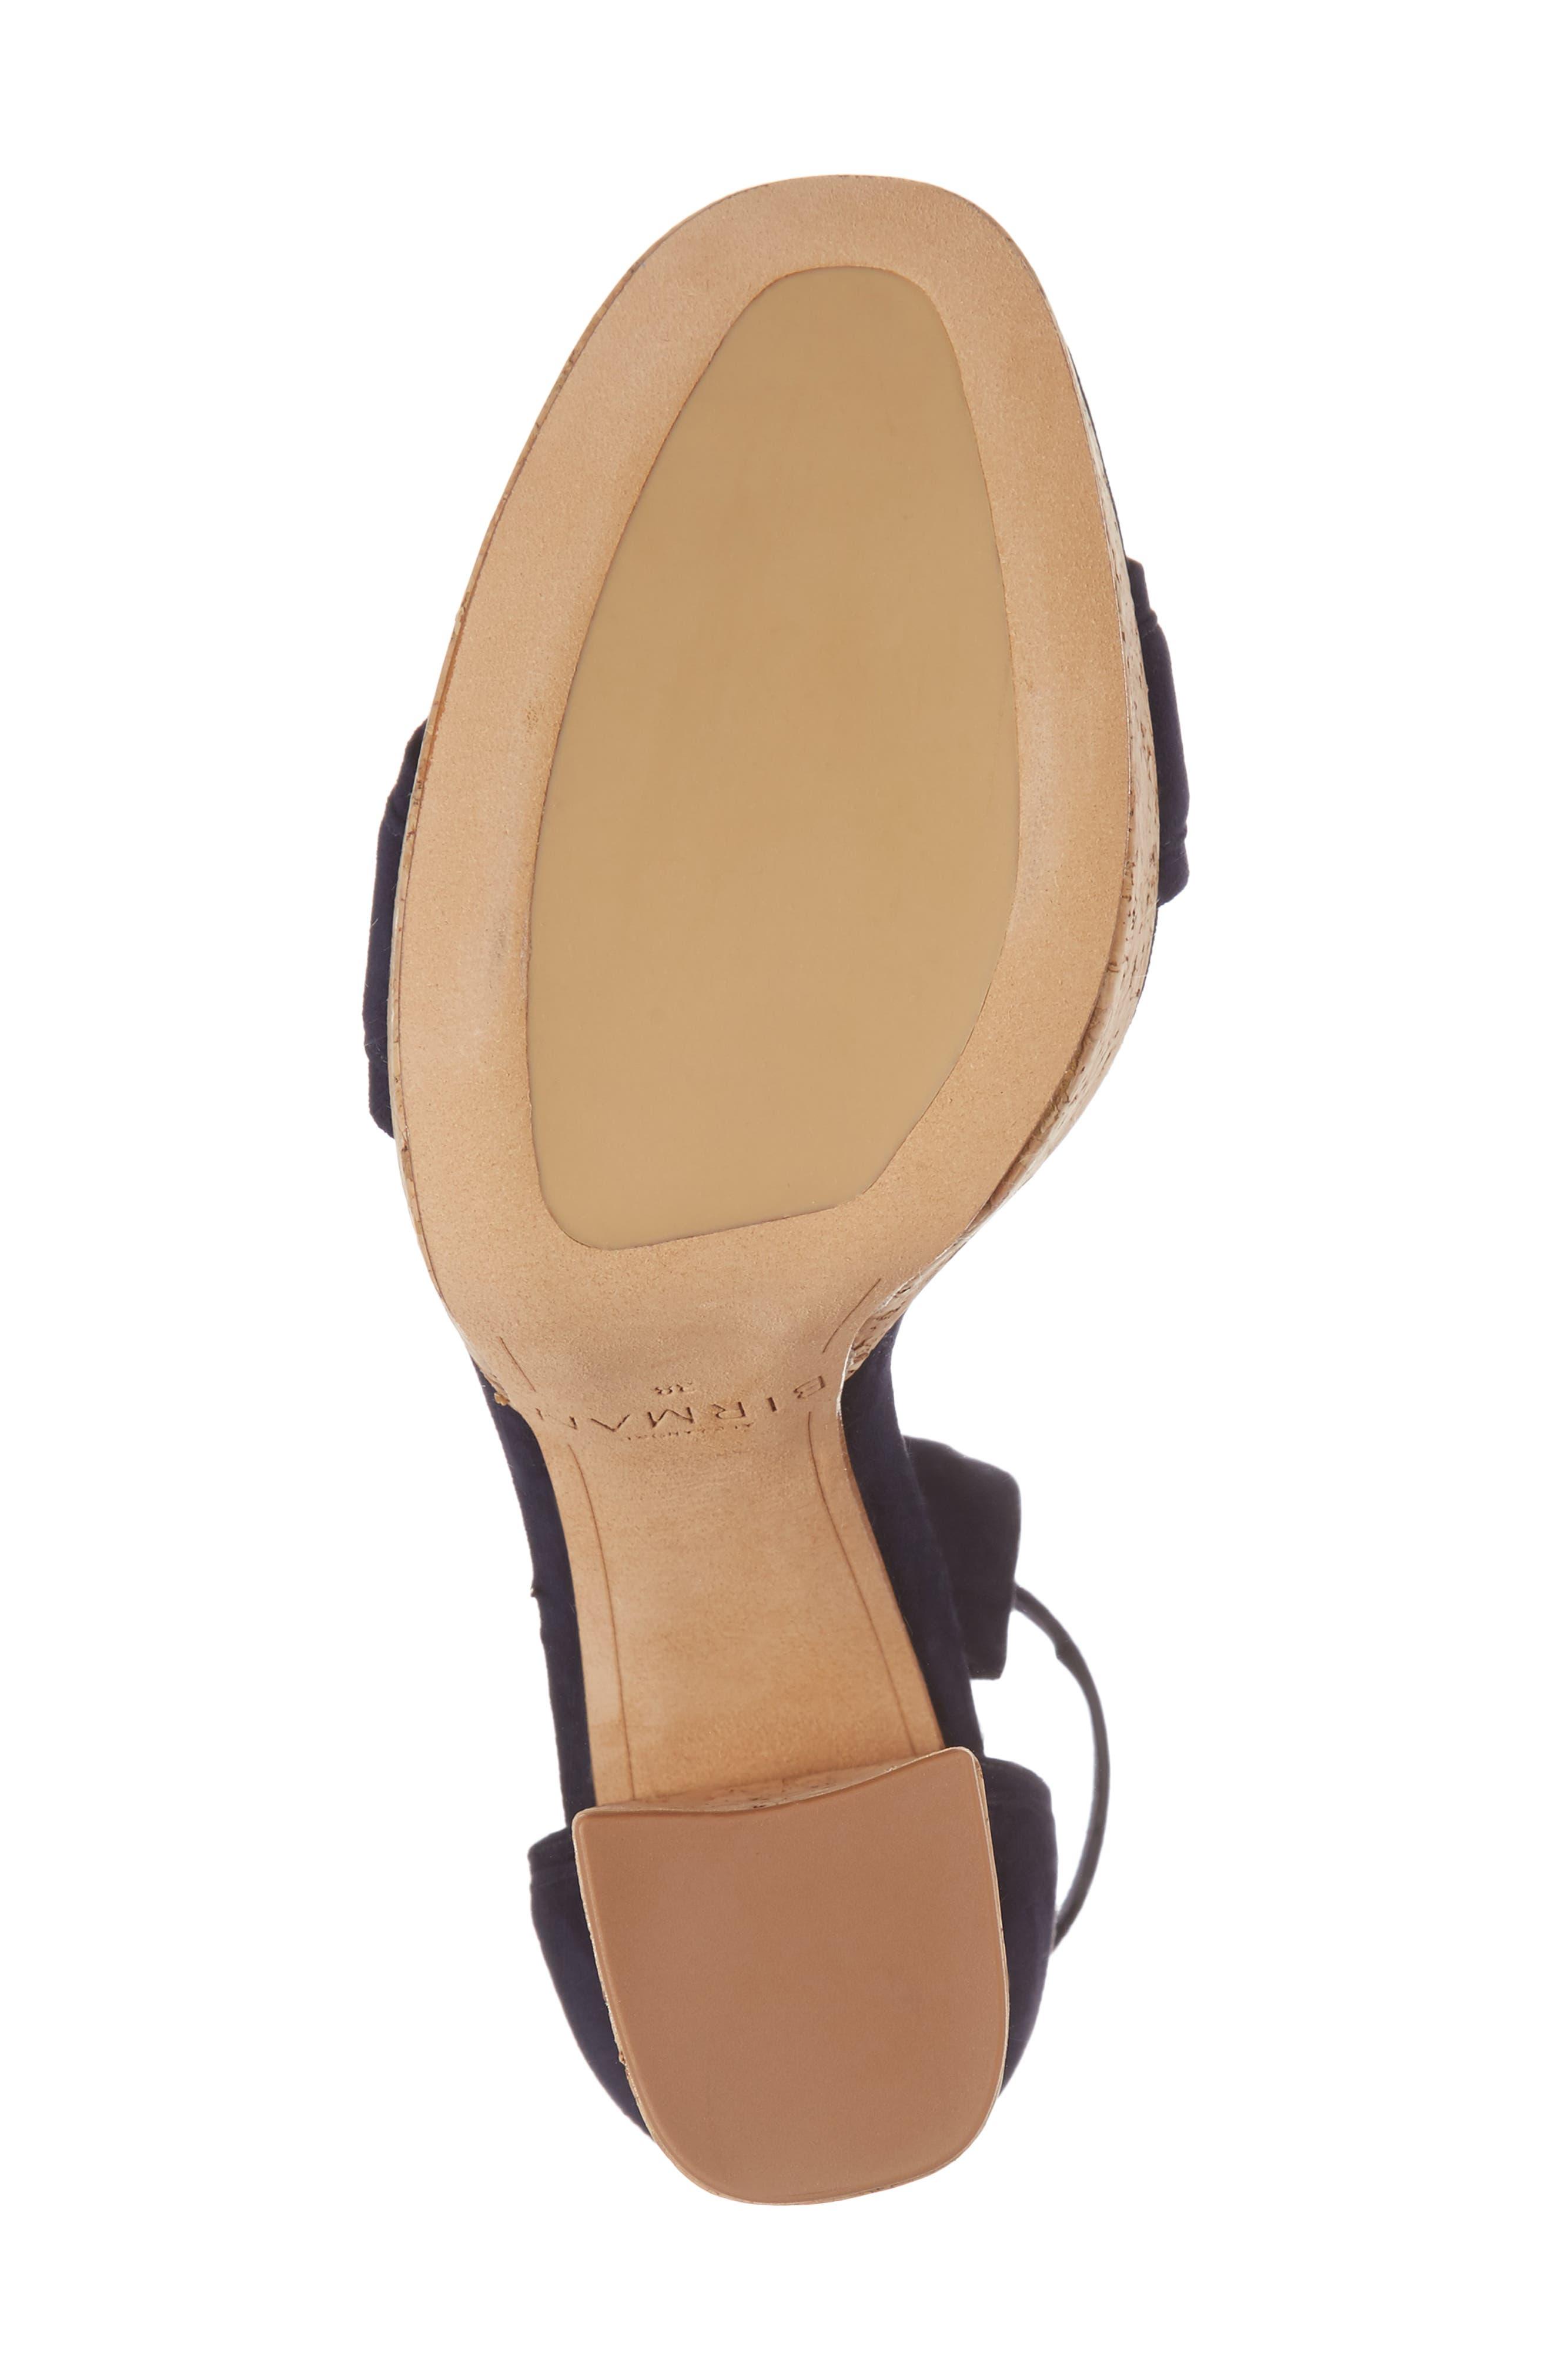 Celine Ankle Tie Platform Sandal,                             Alternate thumbnail 6, color,                             400